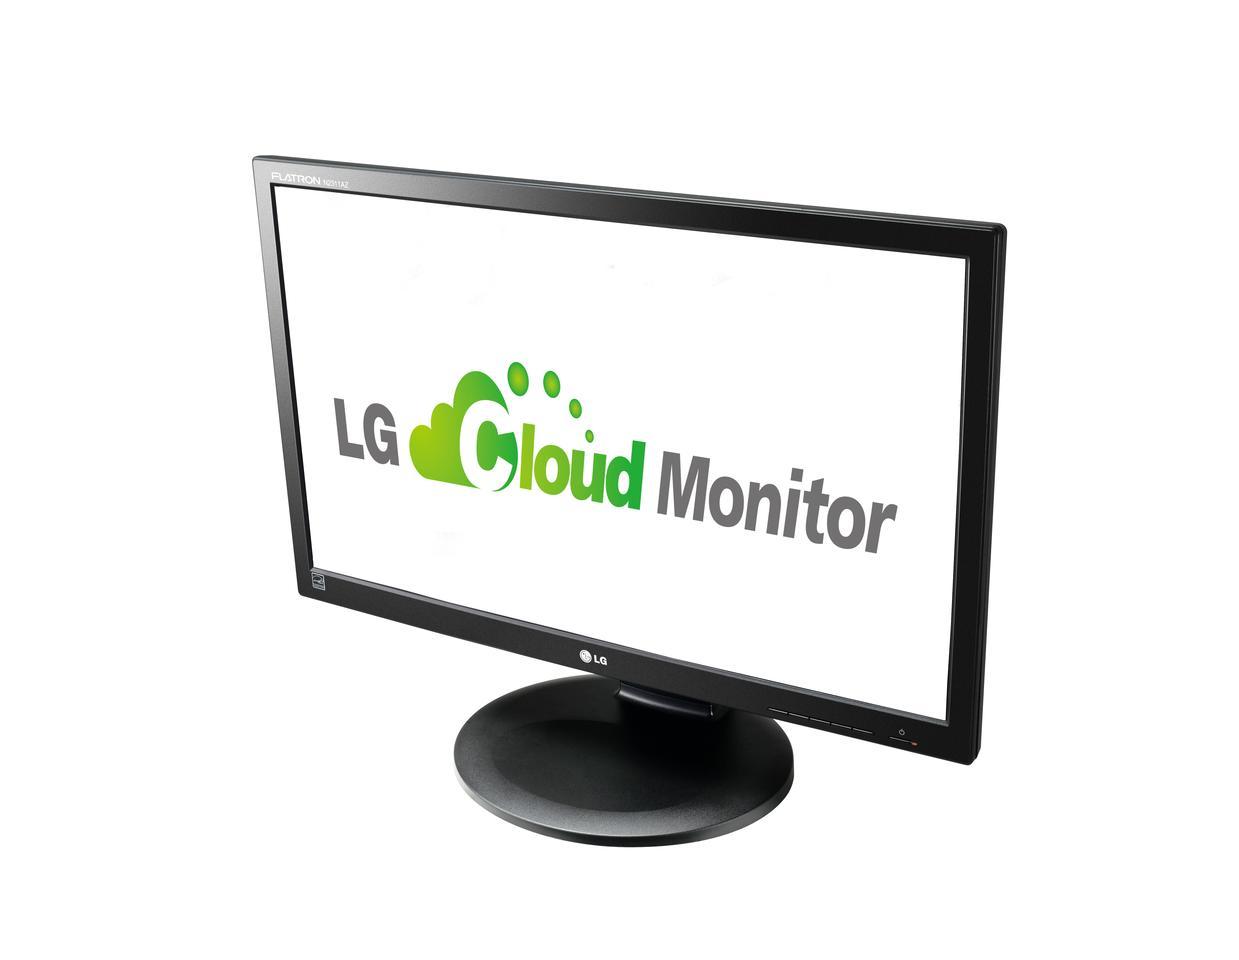 LG P Series cloud monitor